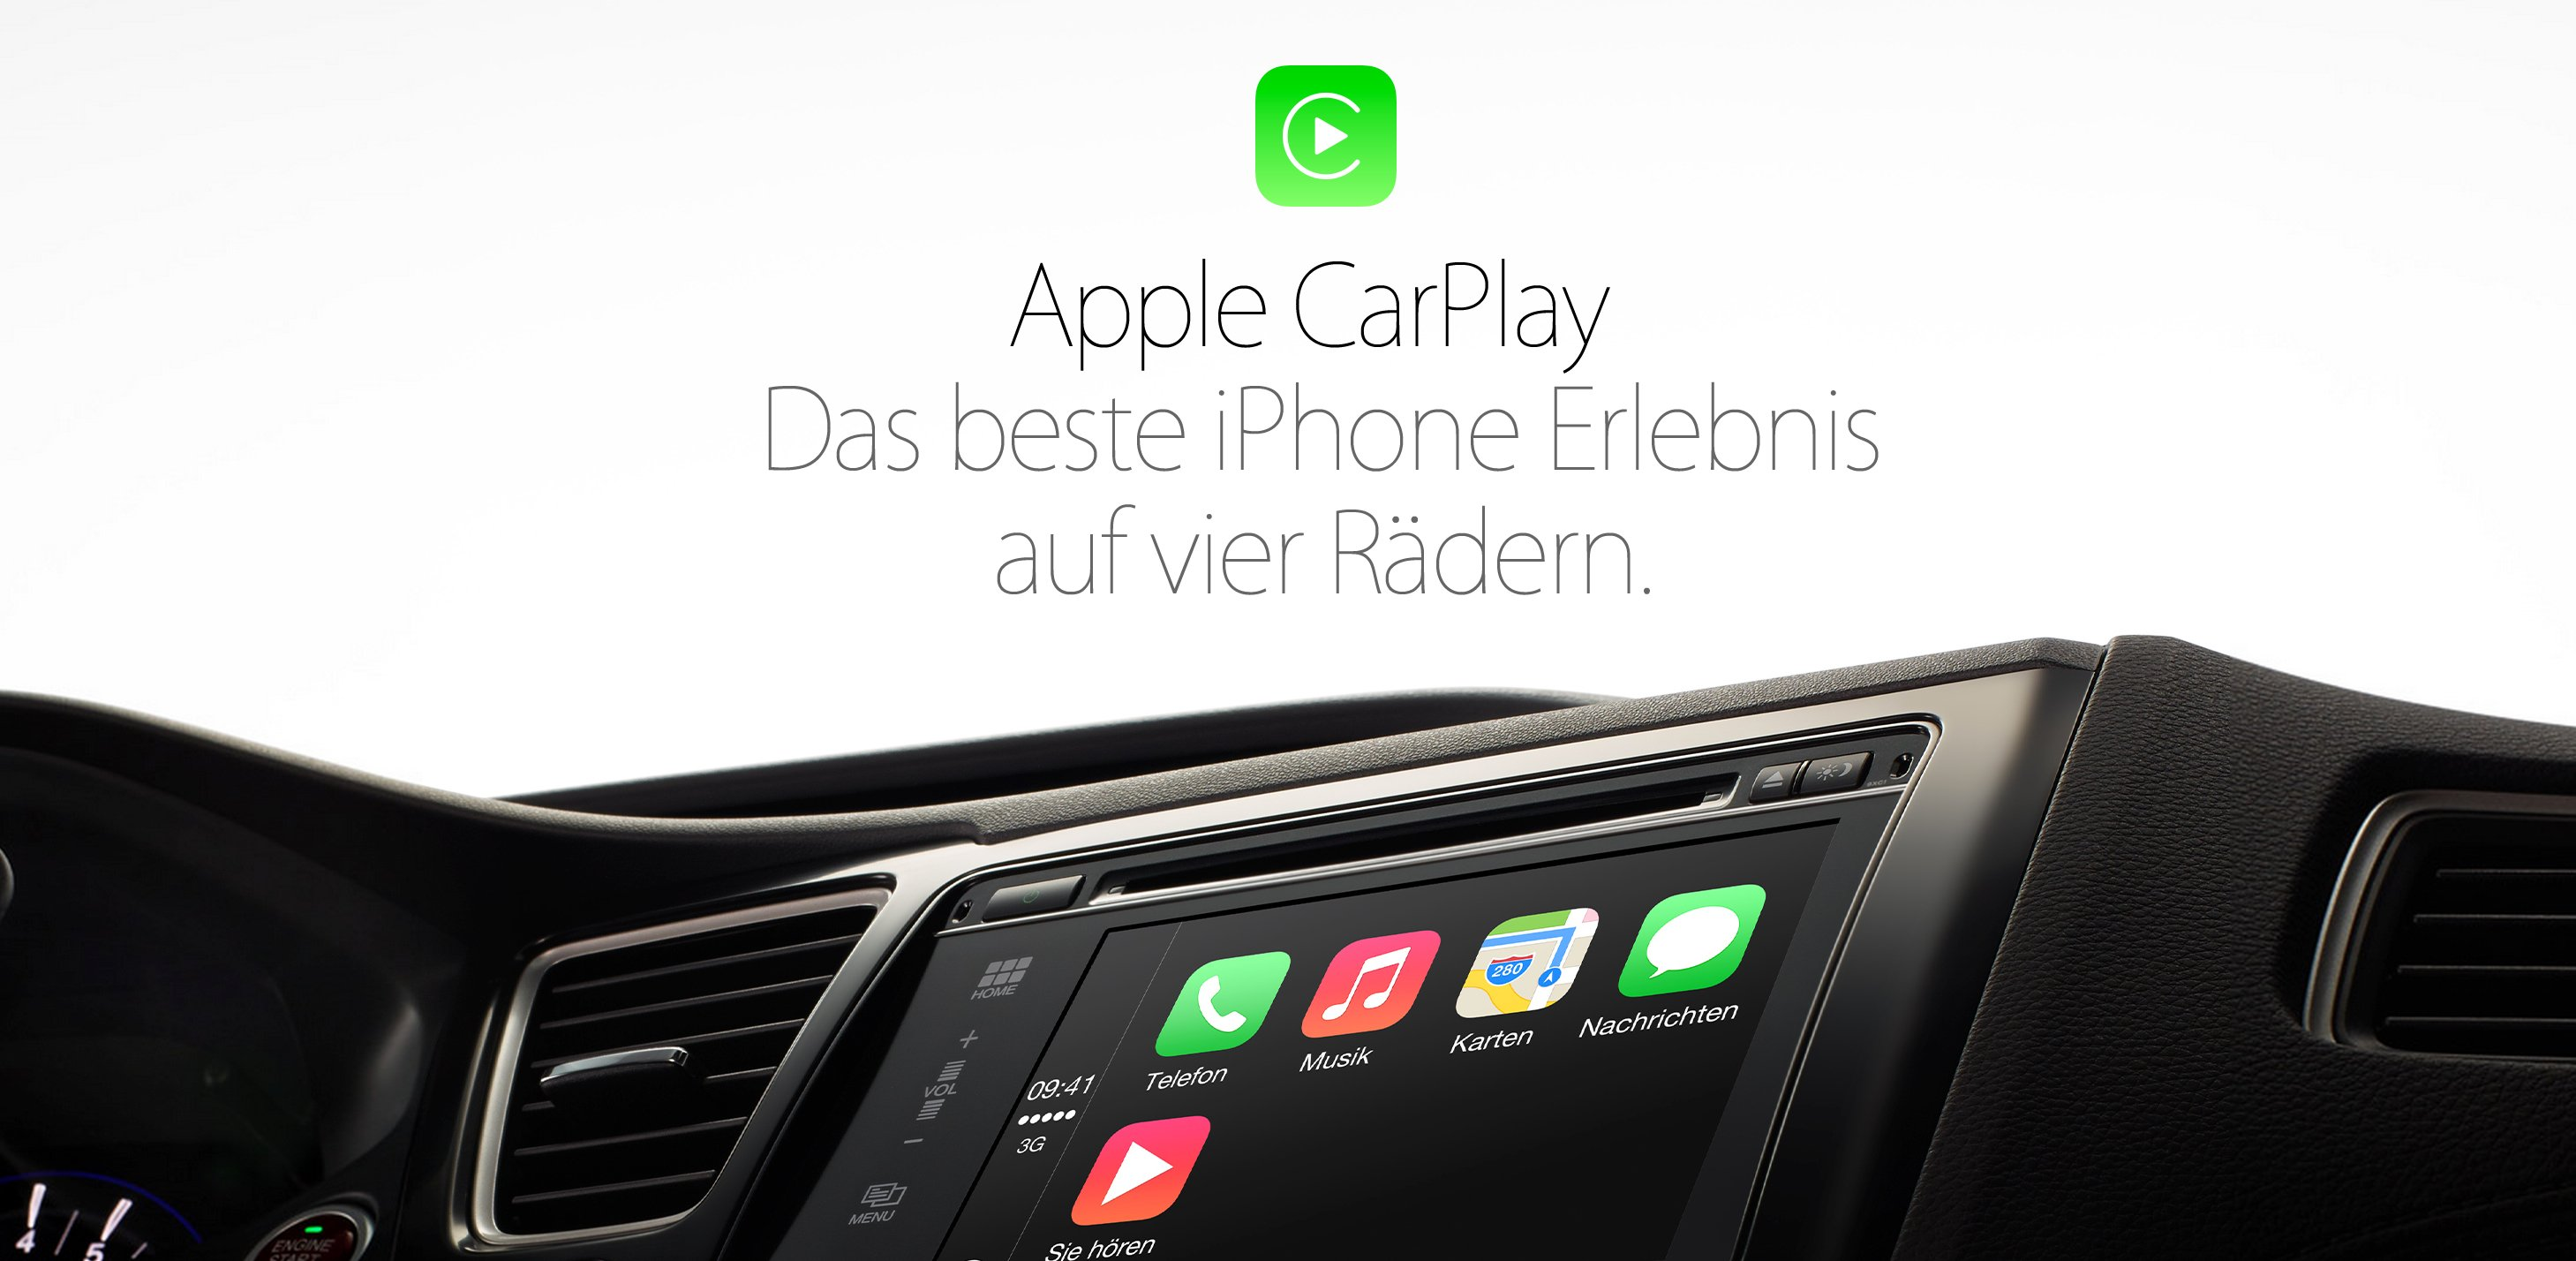 Apple CarPlay mit Audi, BMW, Mercedes-Benz aber ohne VW? 8